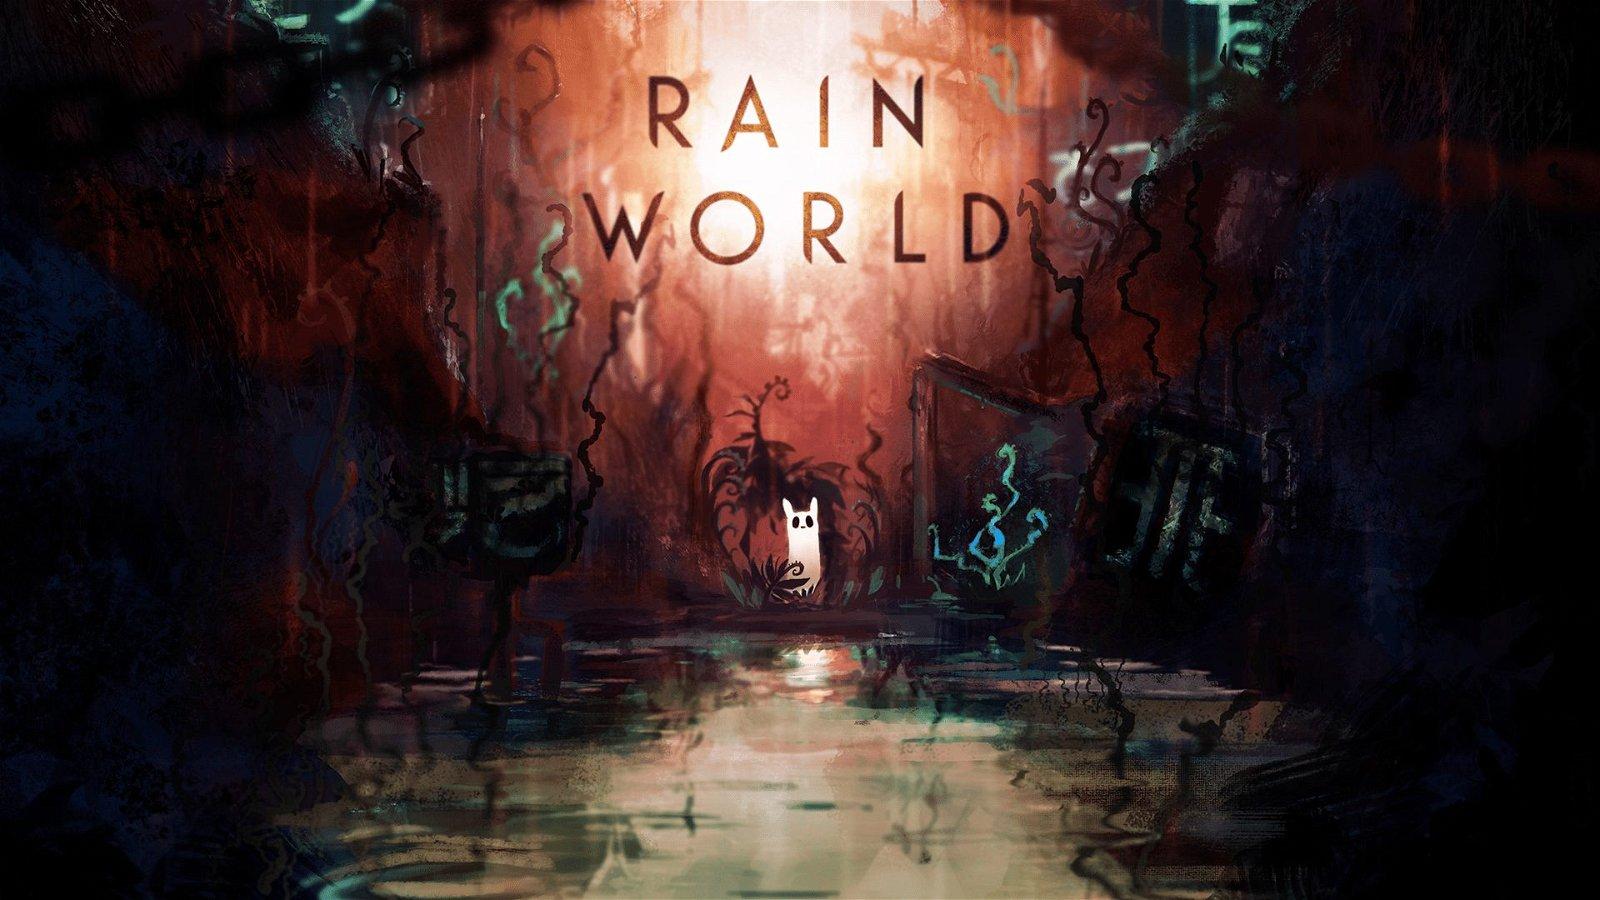 Rain World Review - A Milestone in Animation 1